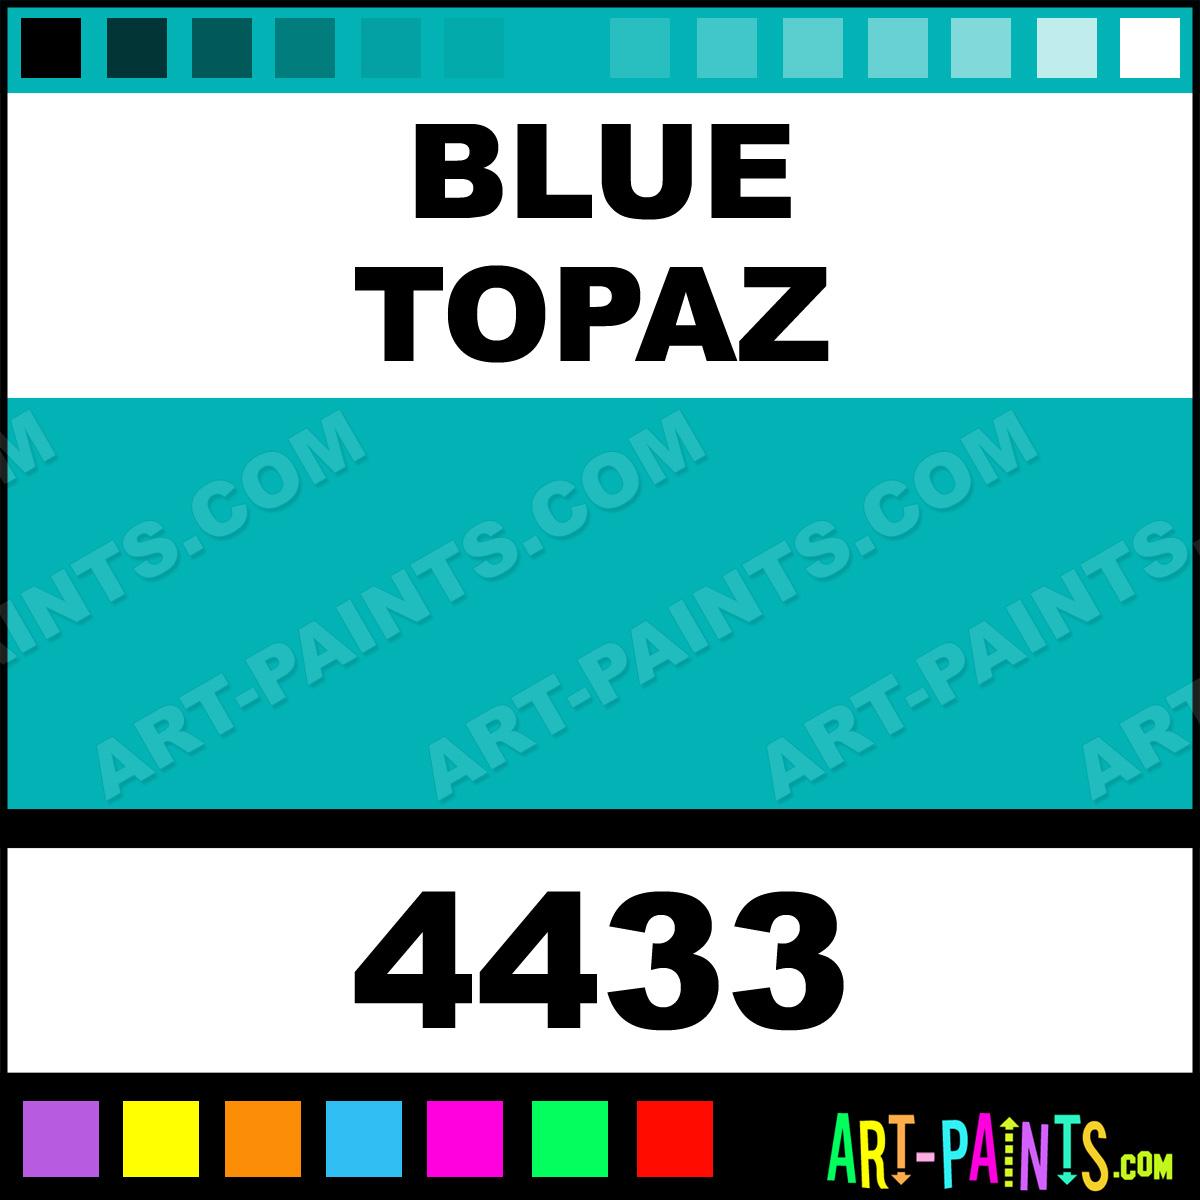 Folk art color chart acrylic paint - Blue Topaz Paint 4433 By Folk Art